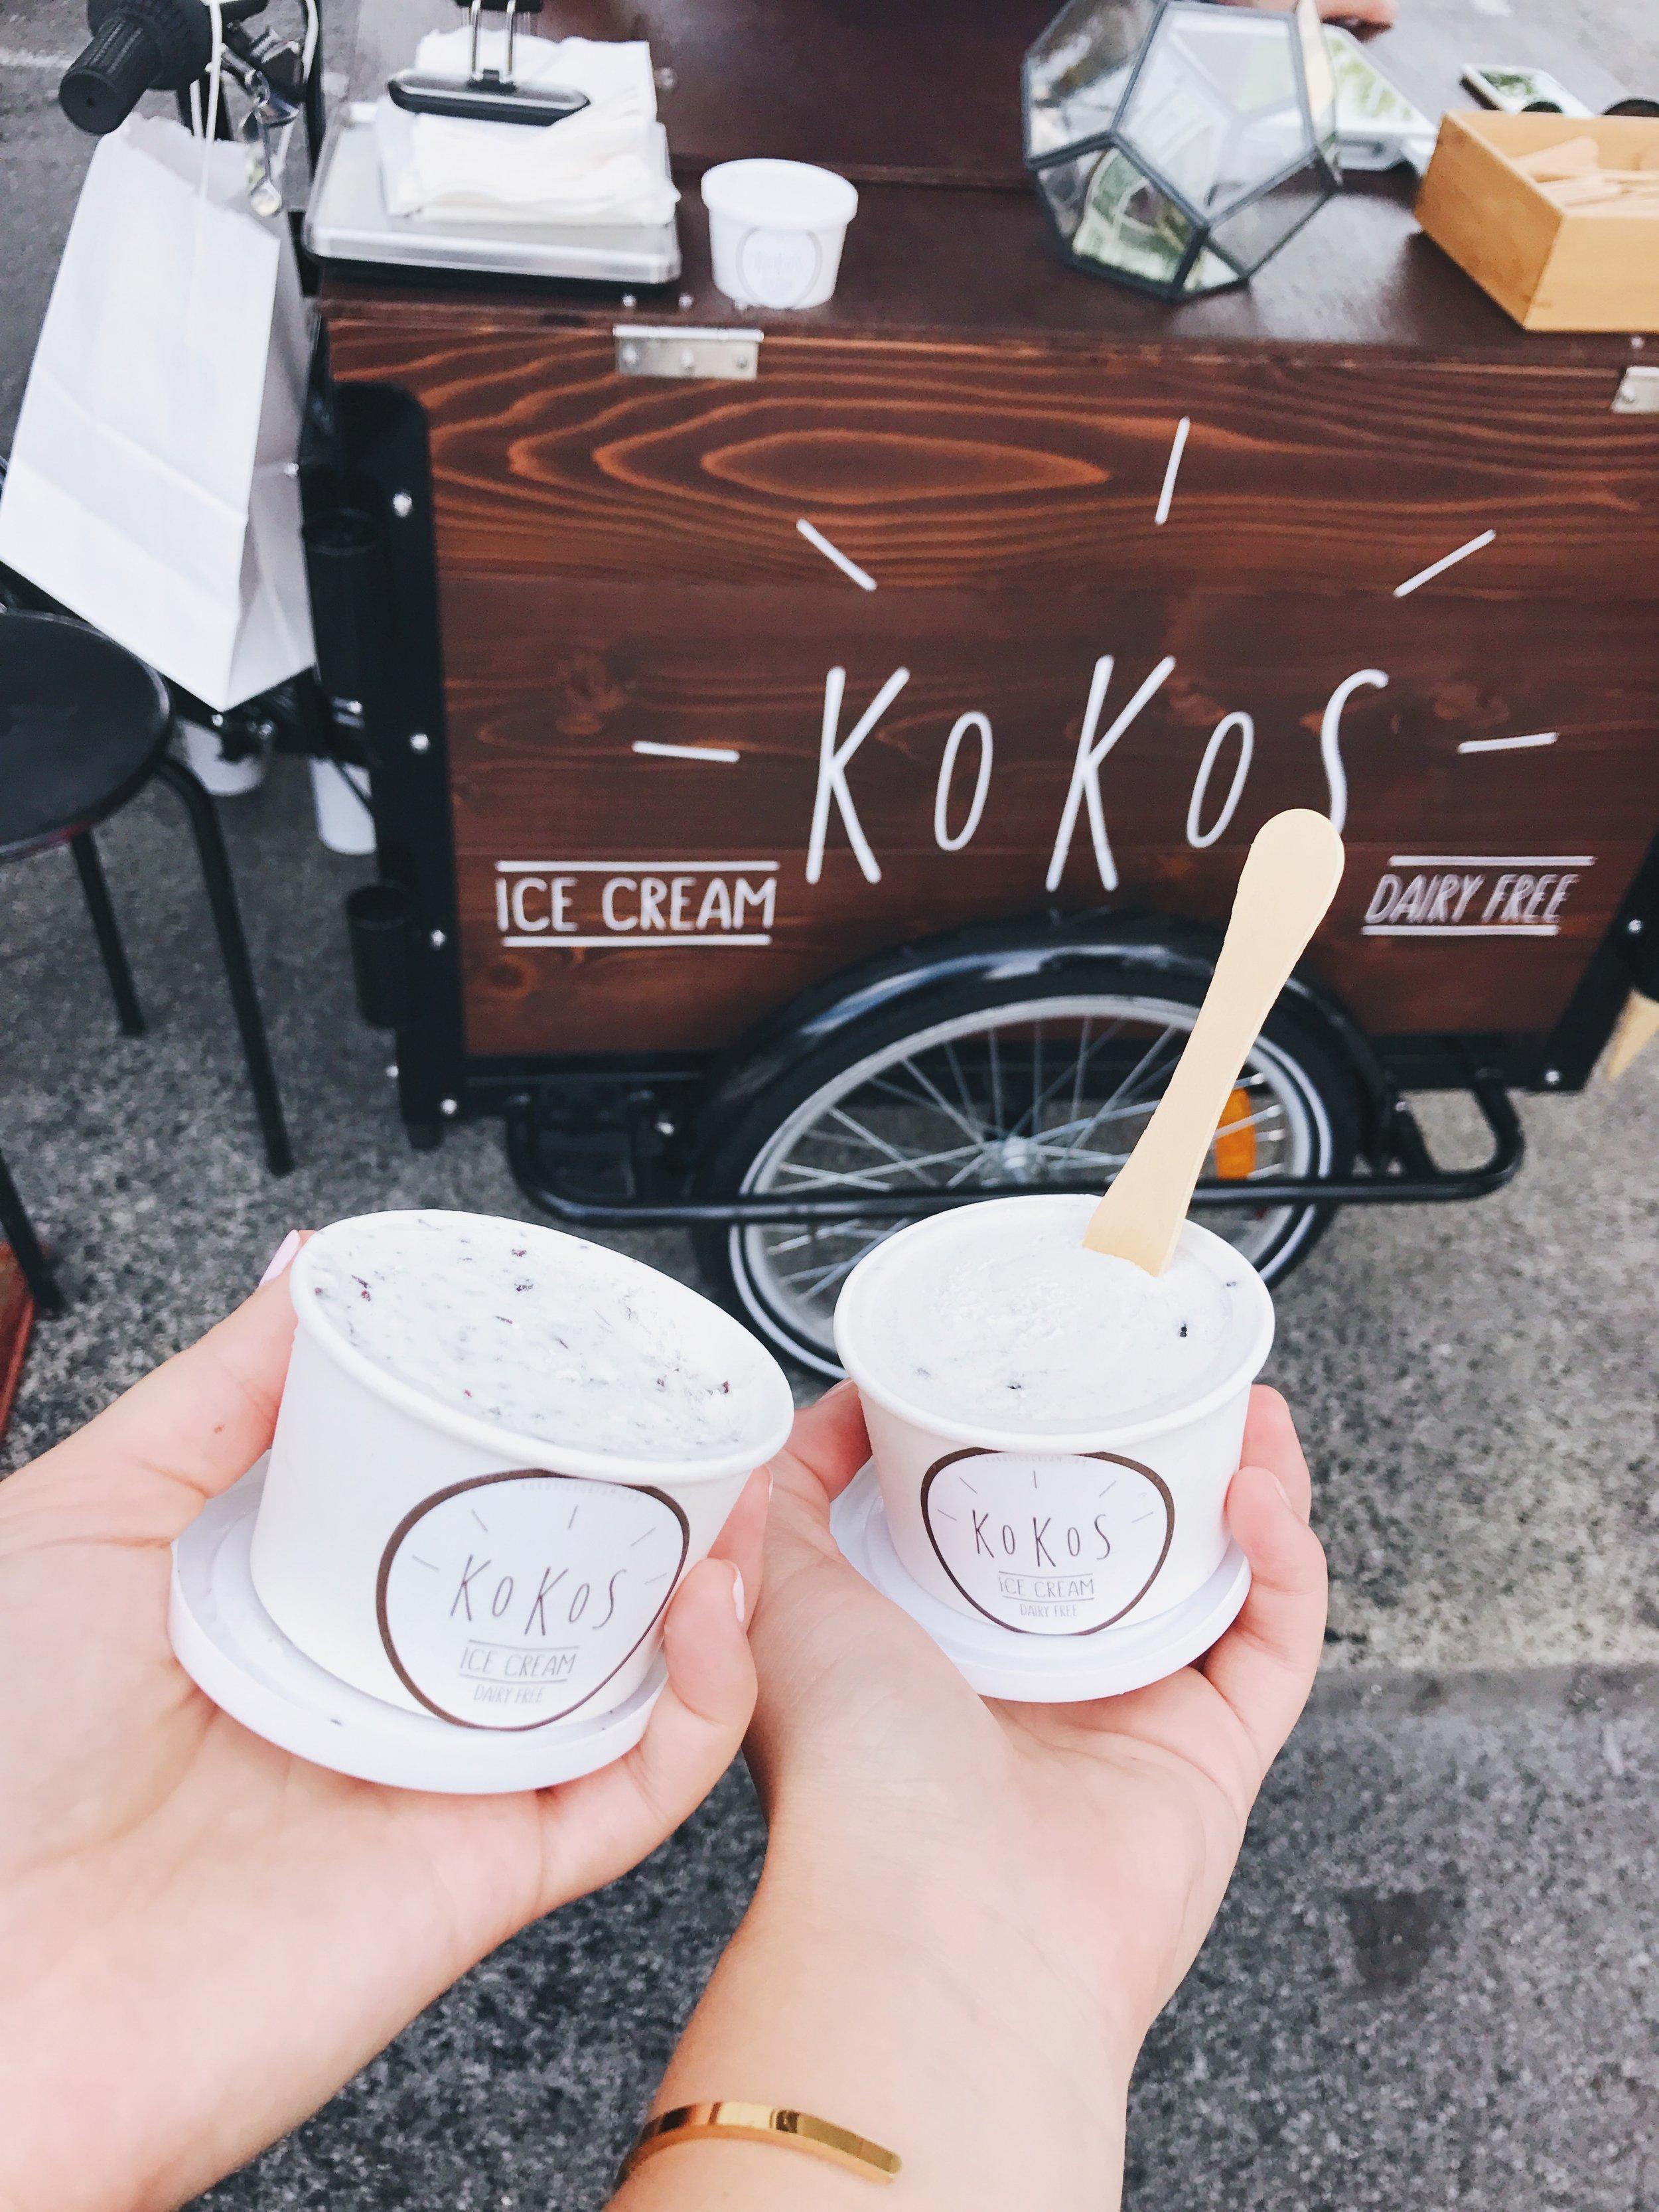 Koko's Ice Cream